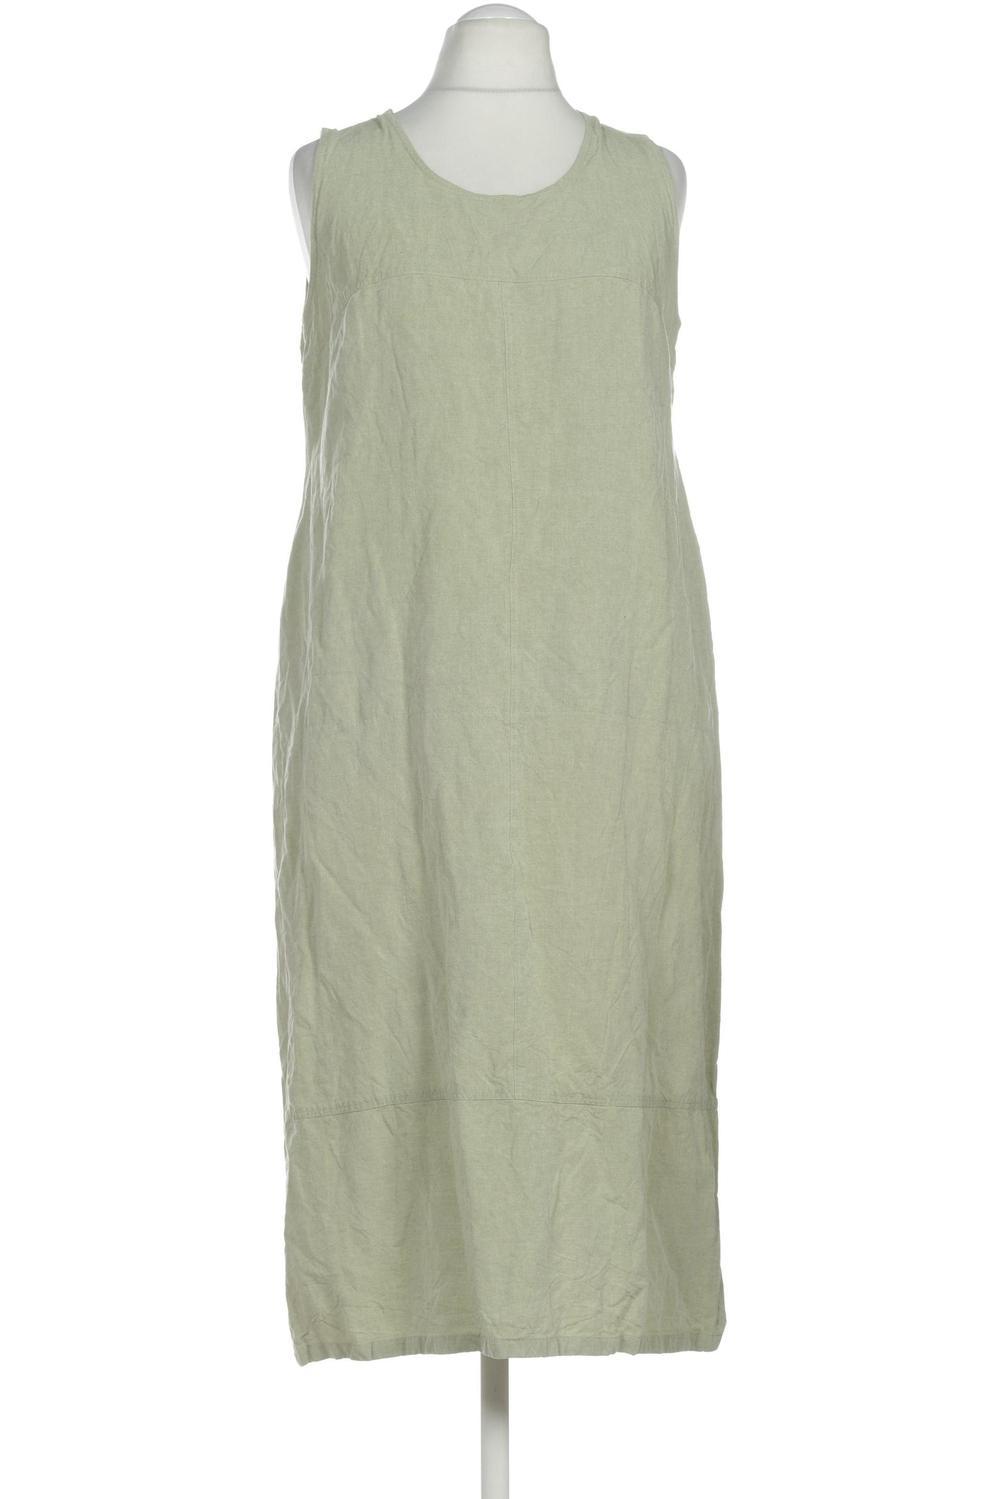 details zu selectionulla popken kleid damen dress damenkleid gr. de 48  kein #2c659ac